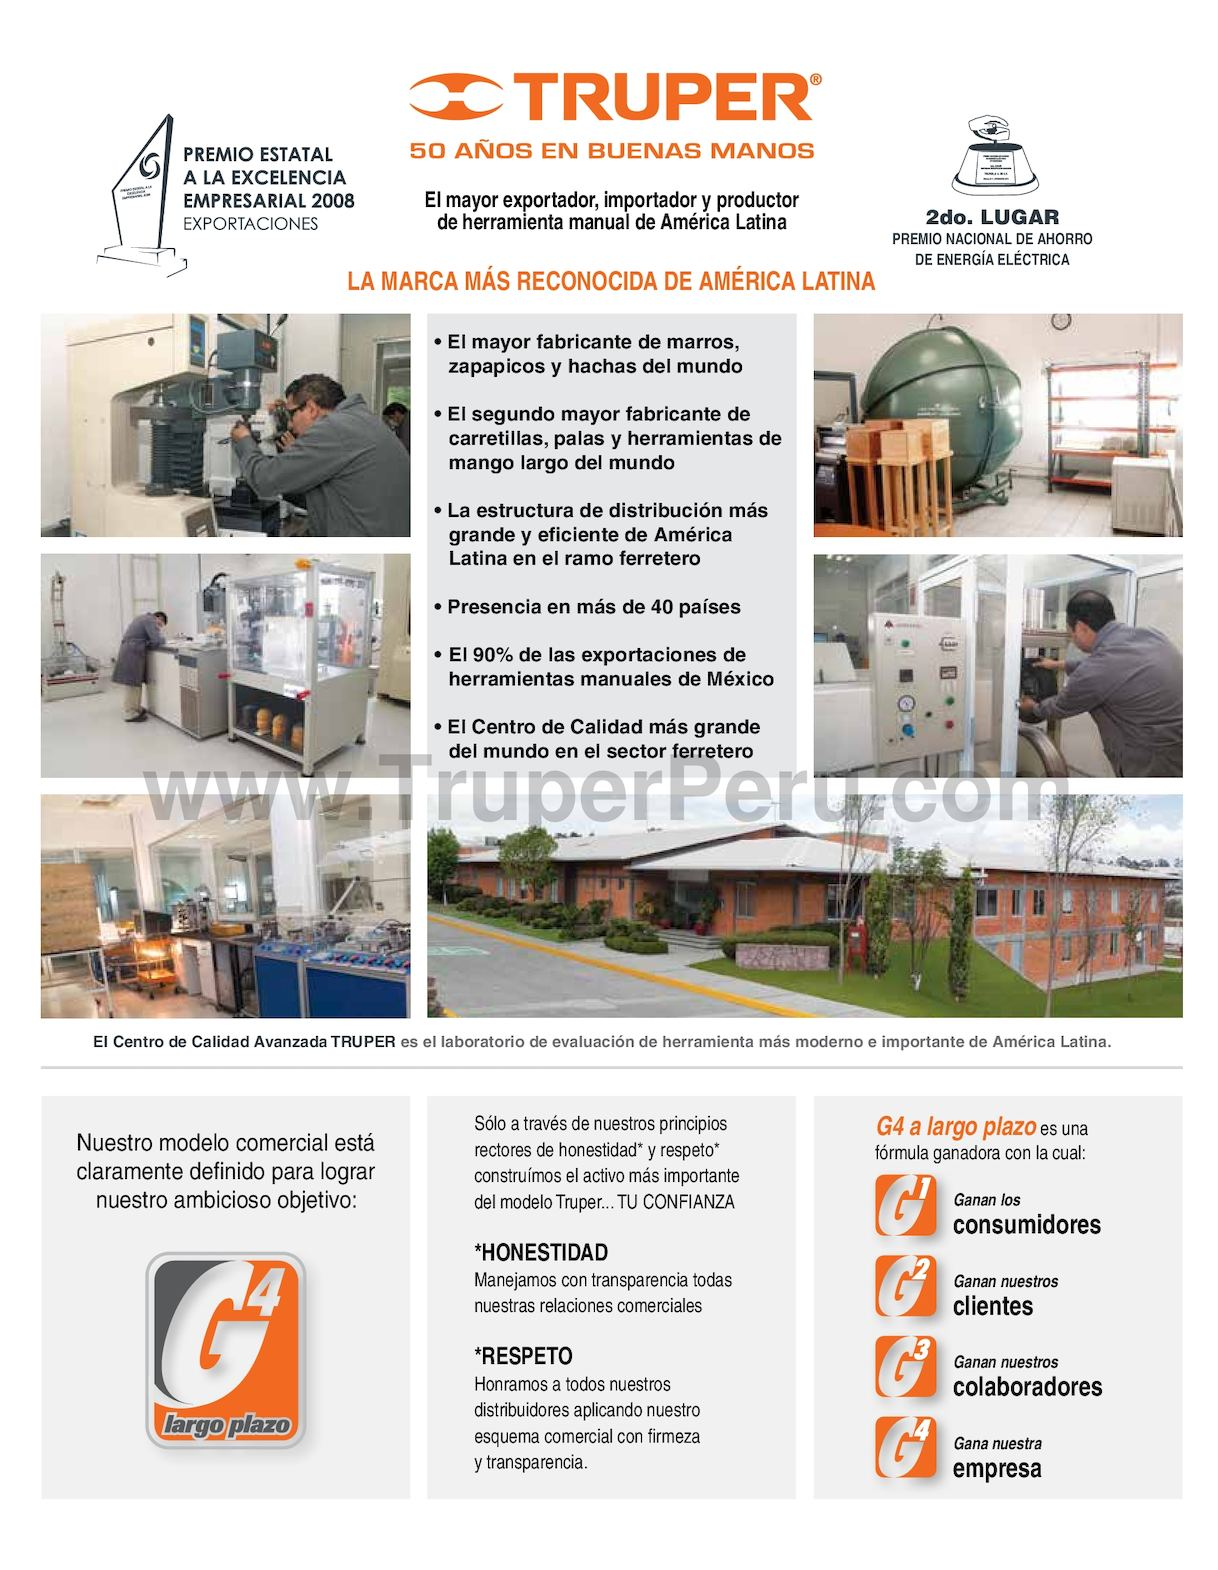 Calaméo - Catálogo Distribuidor Truper Peru Www Truperperu Com Lima 9a166244c6c8